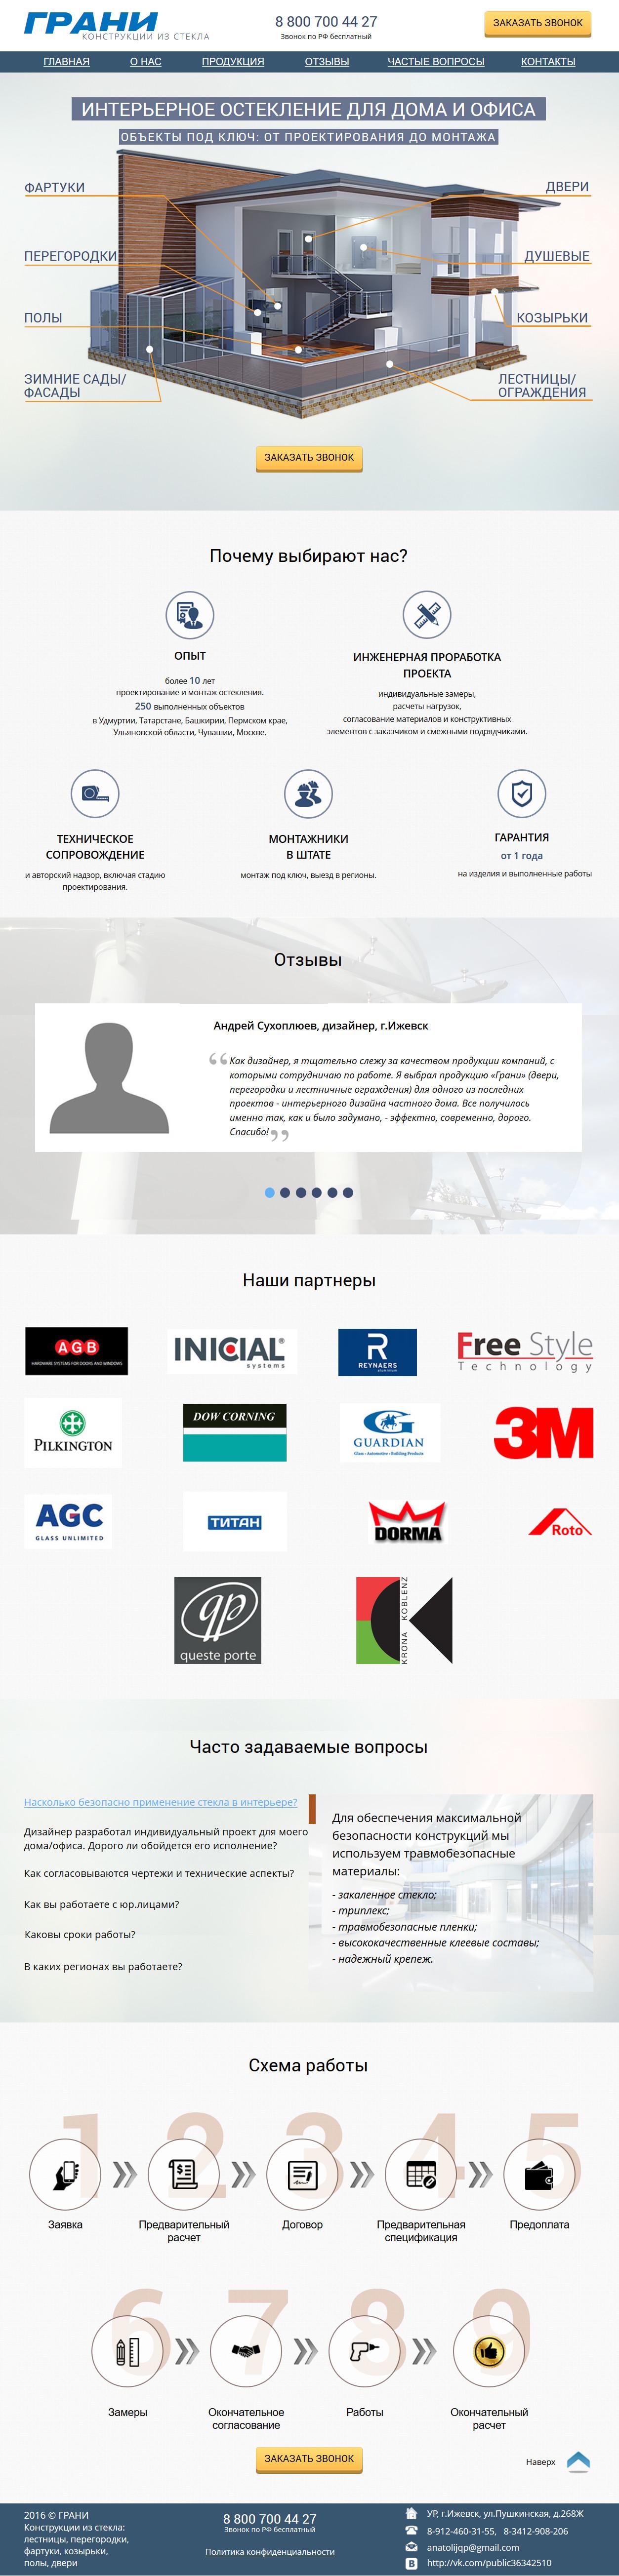 Корпоративный сайт для компании Грани